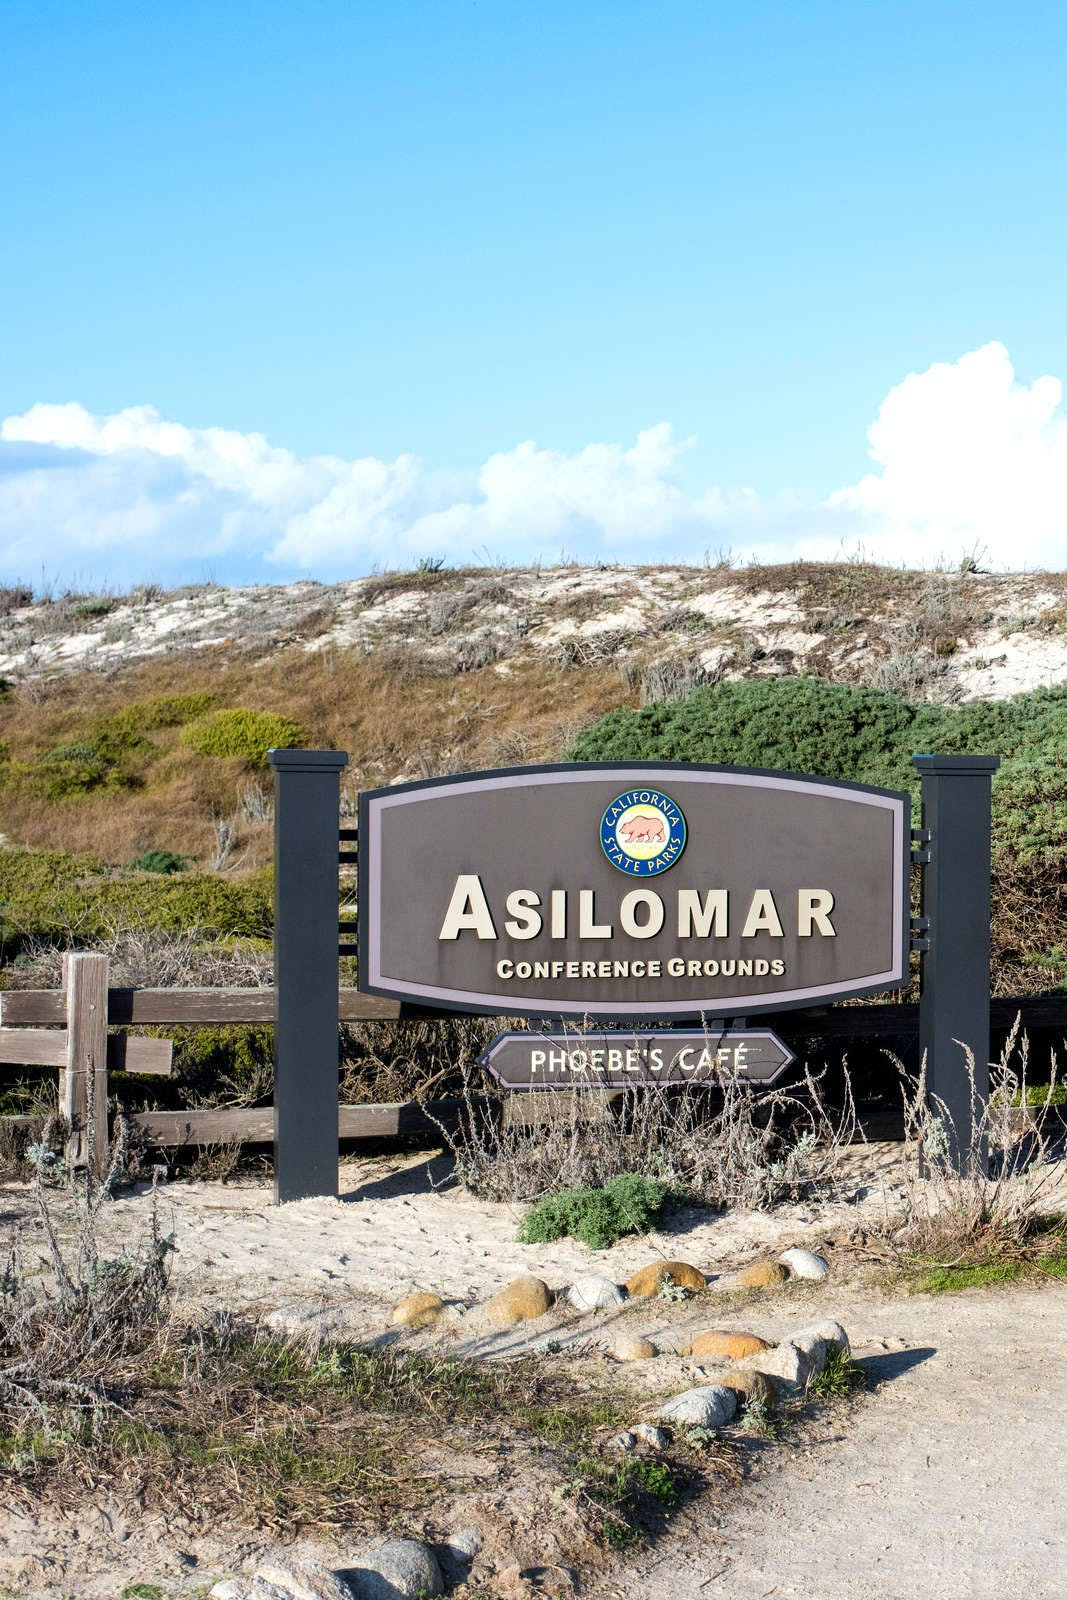 Asilomar Conference Grounds